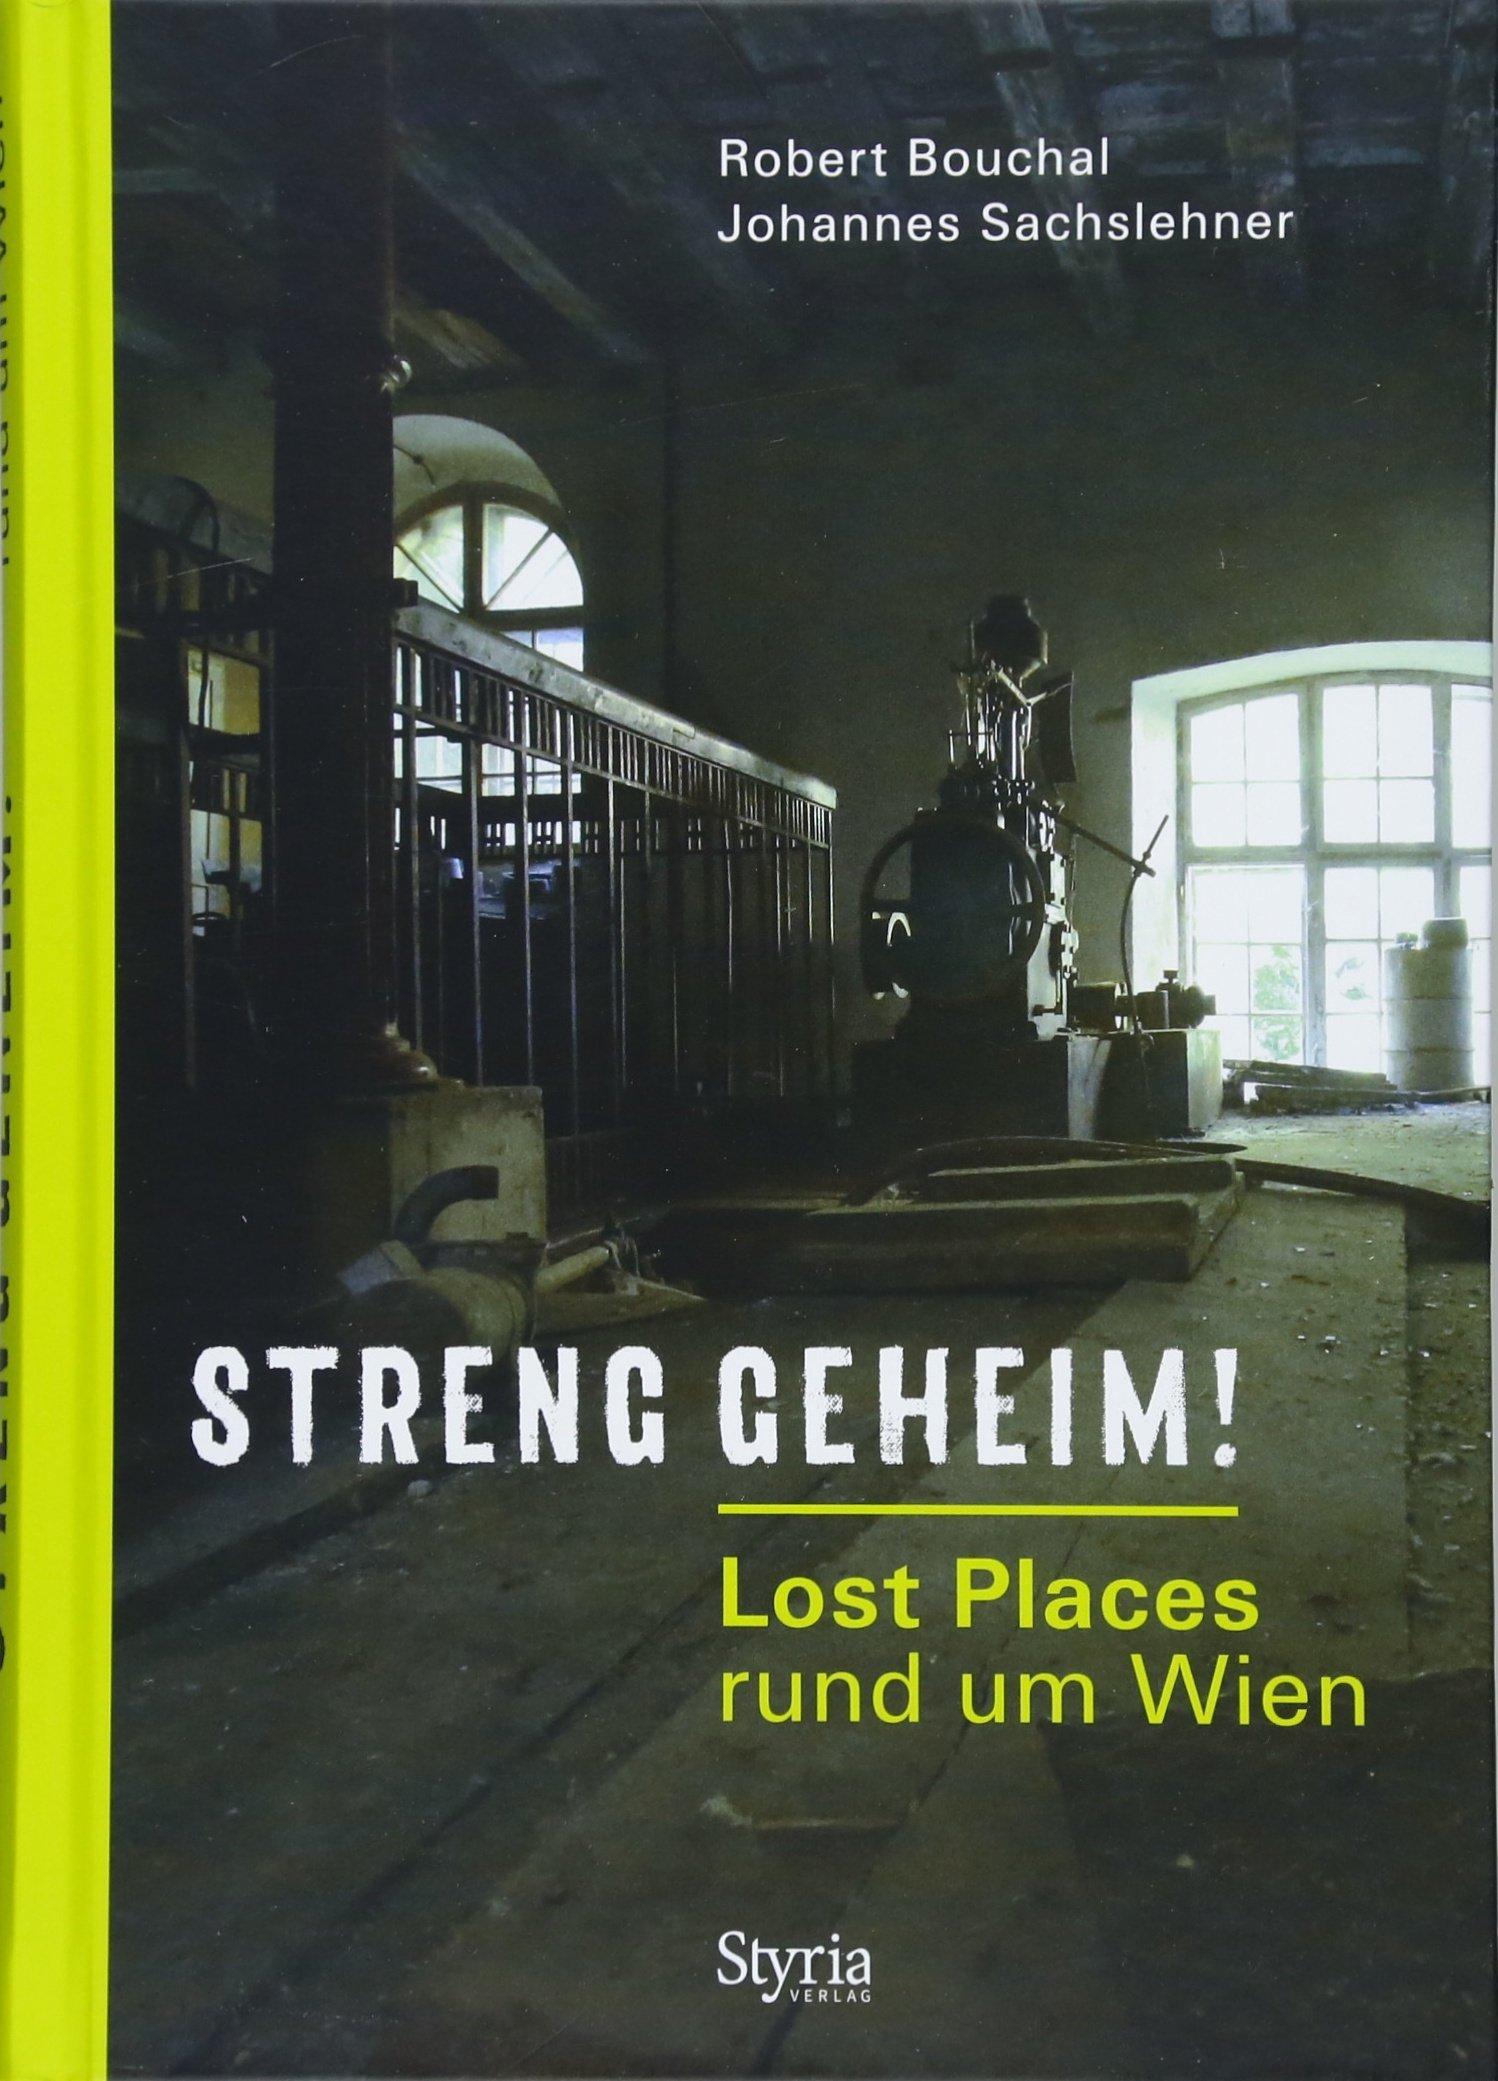 Streng geheim!: Lost Places rund um Wien: Amazon.de: Robert Bouchal ...